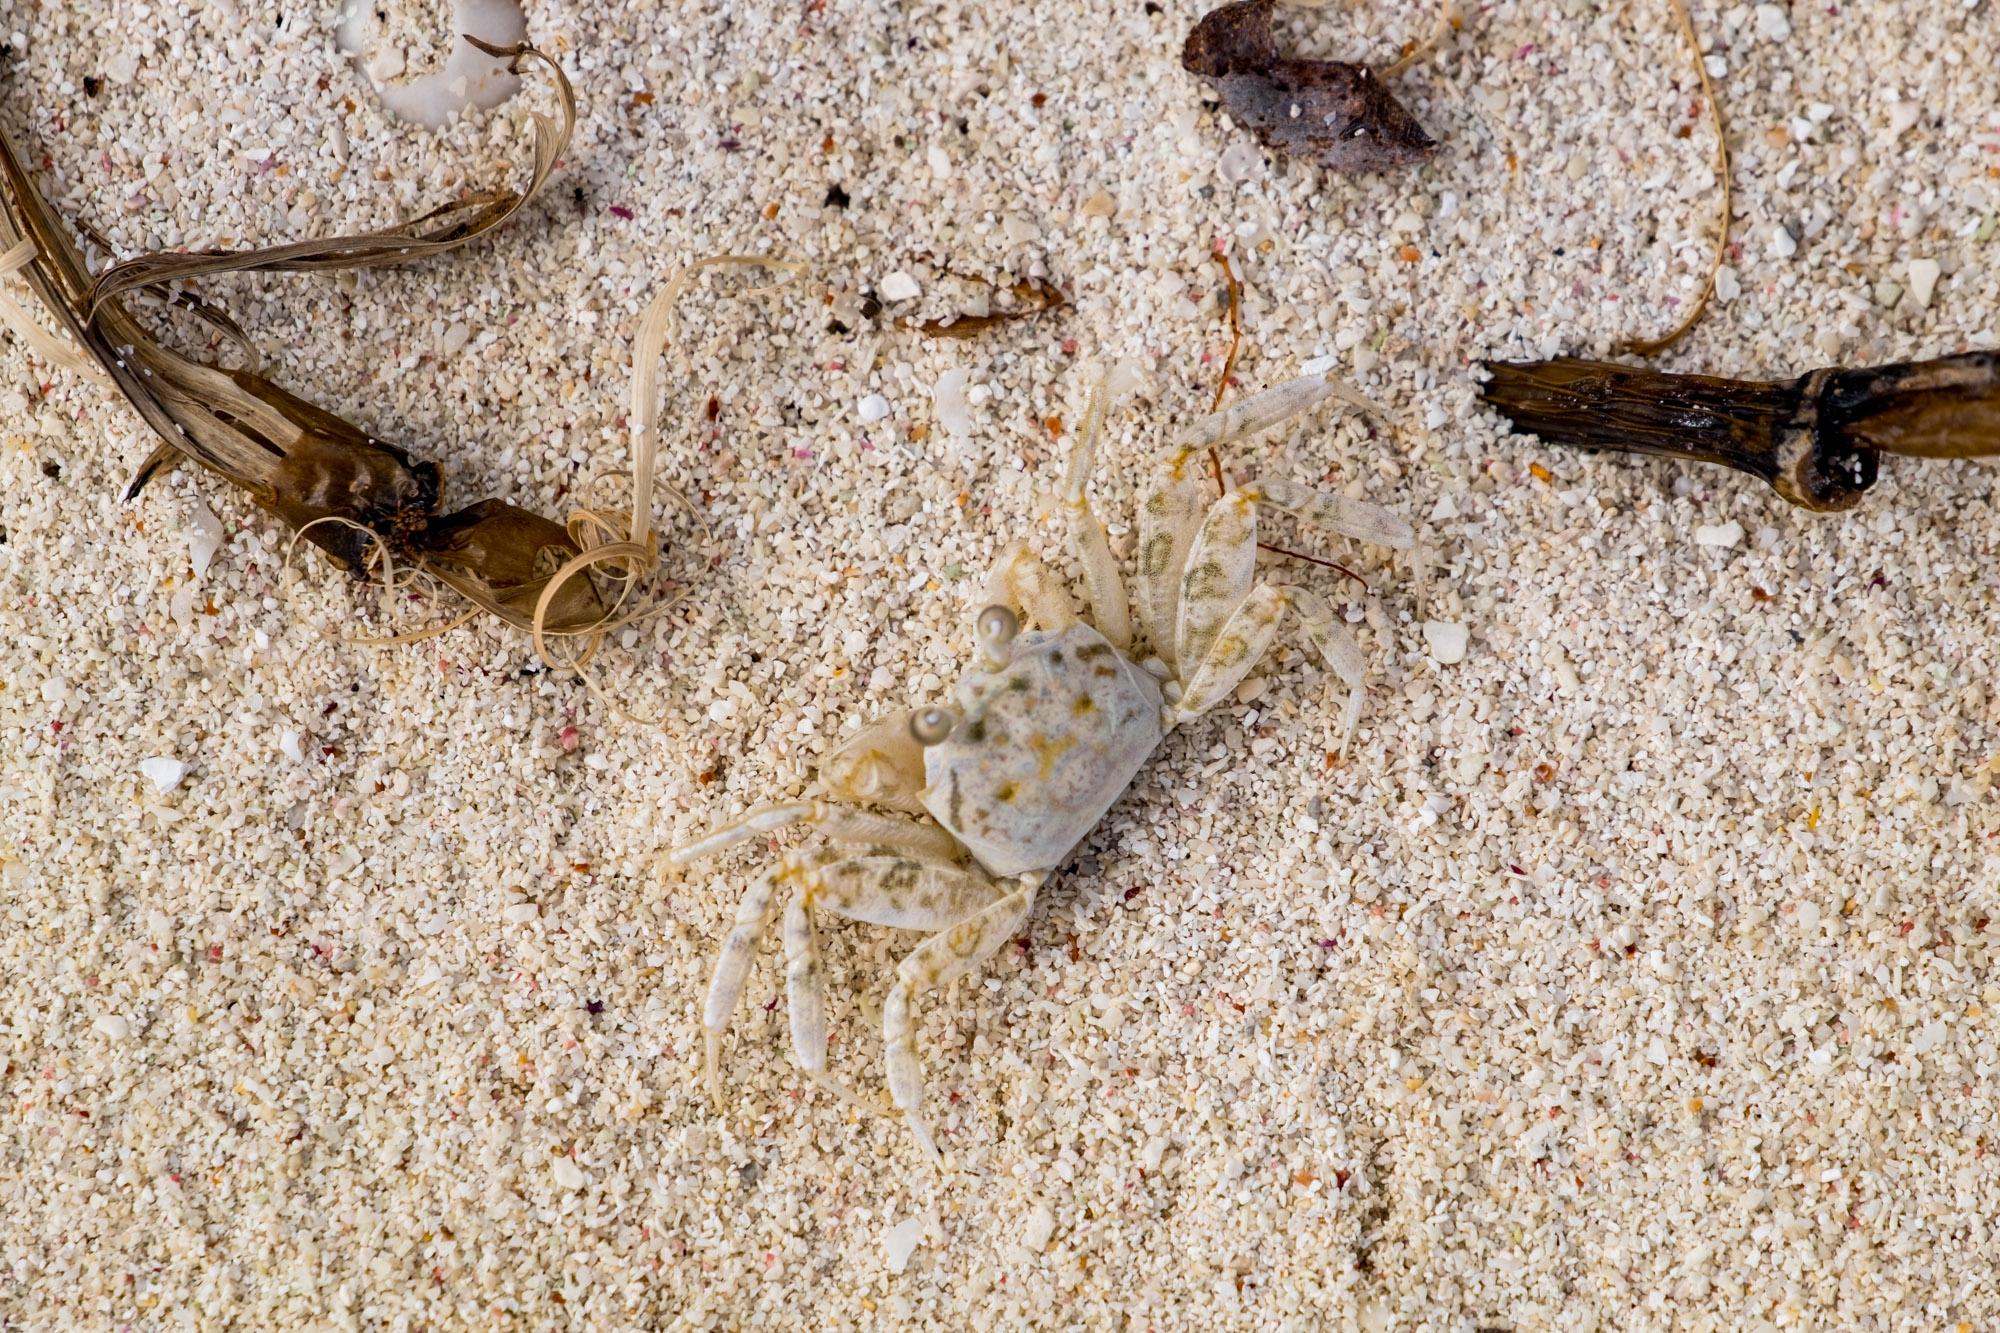 Camoflauged crab.